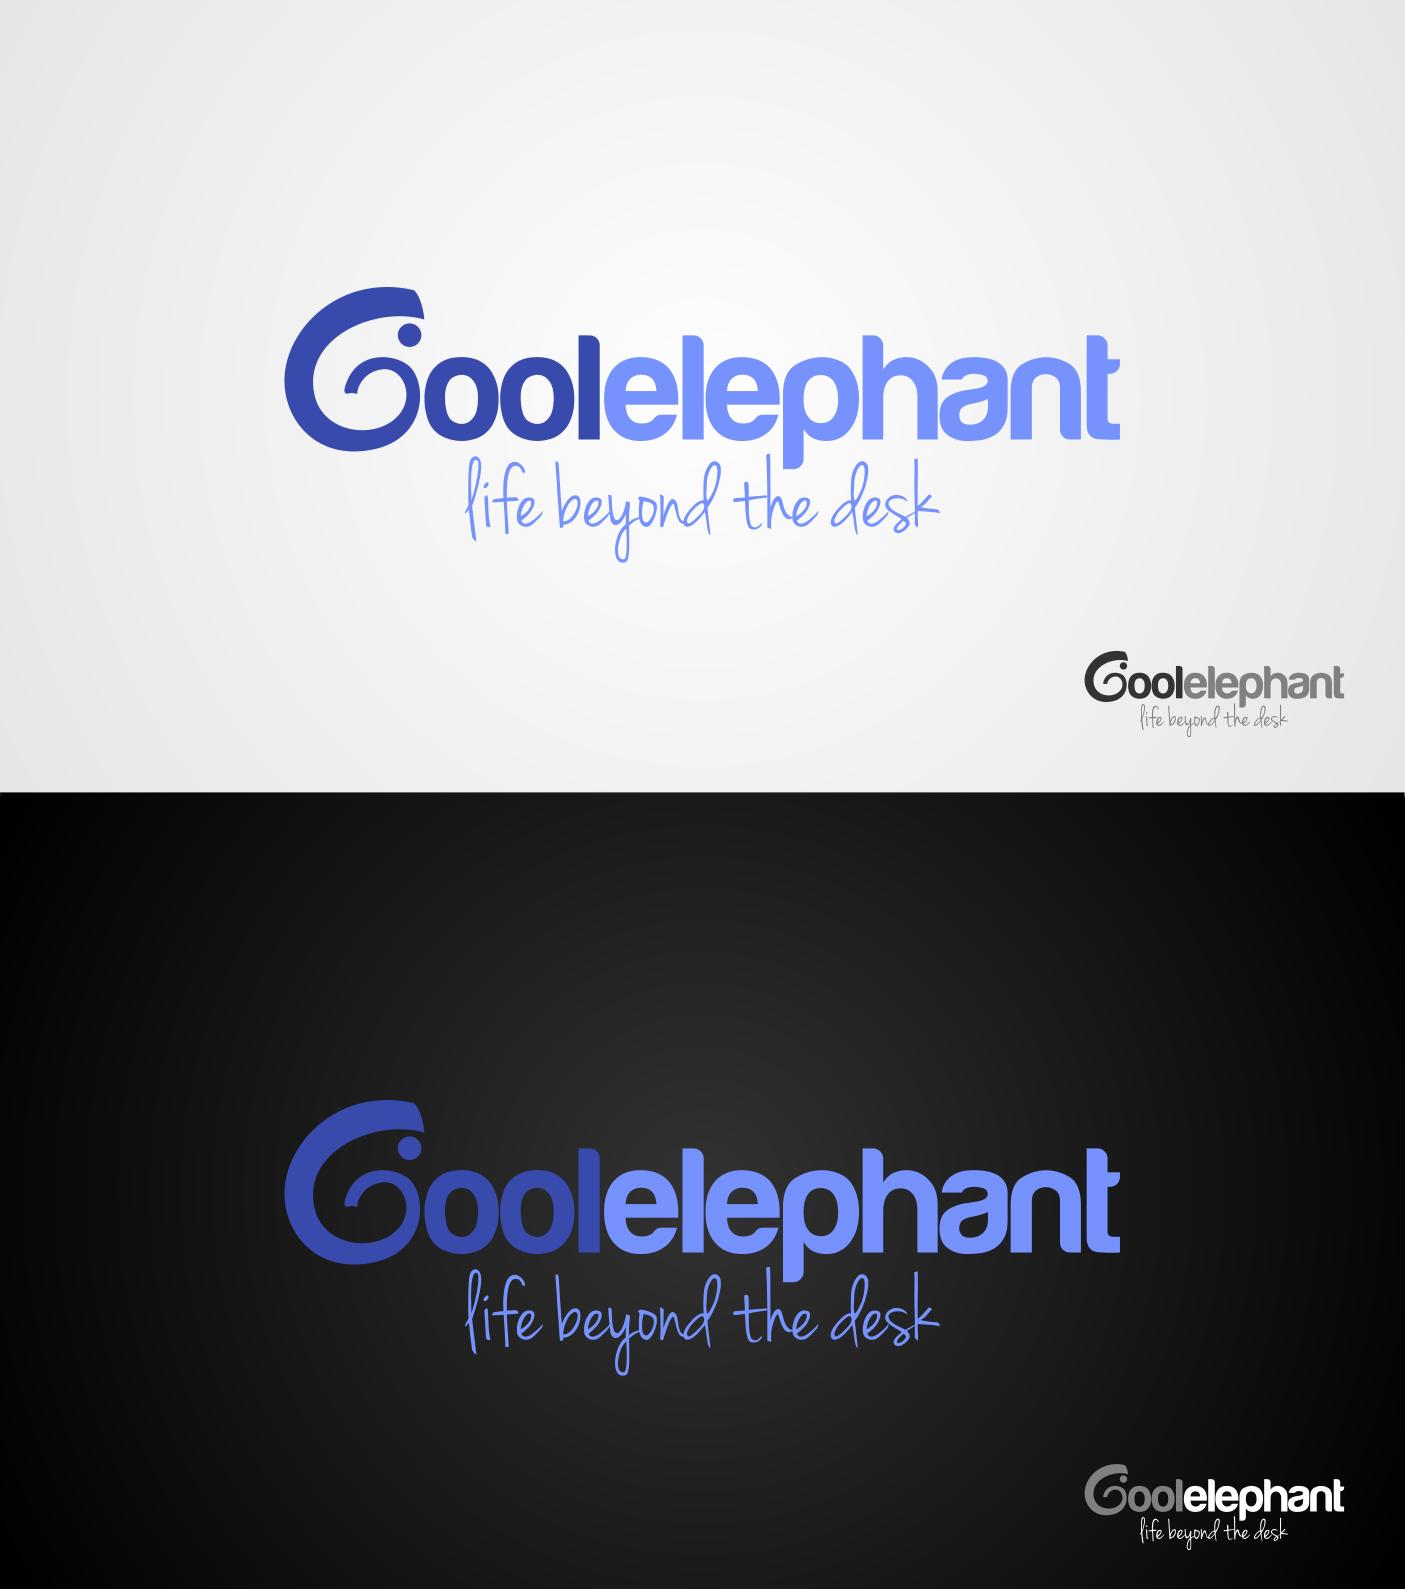 Cool Elephant needs a new logo